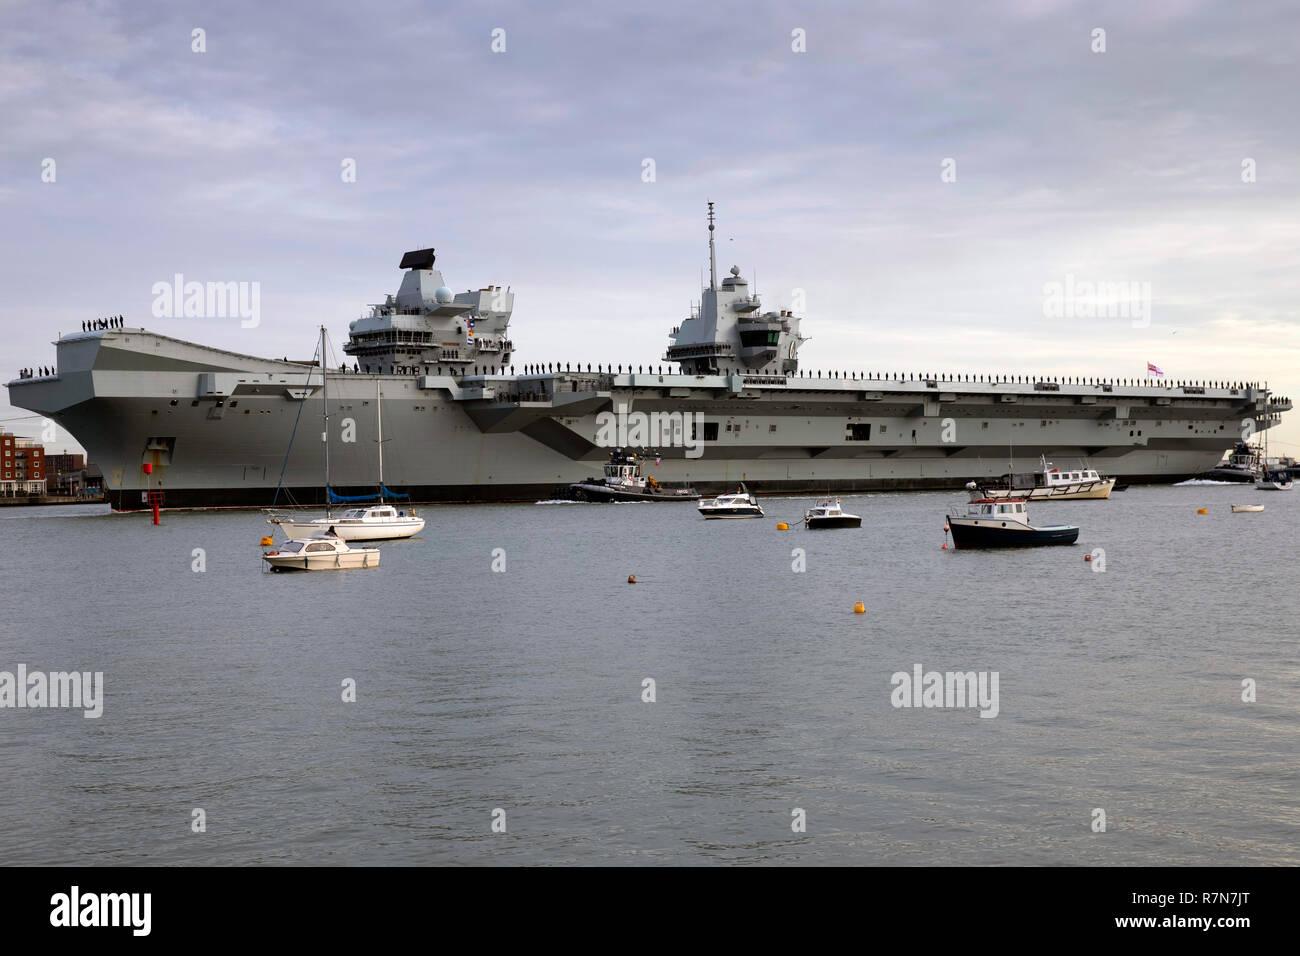 Royal Navy flagship HMS Queen Elizabeth arriving at her home port of Portsmouth on 10 December 2018 - Stock Image